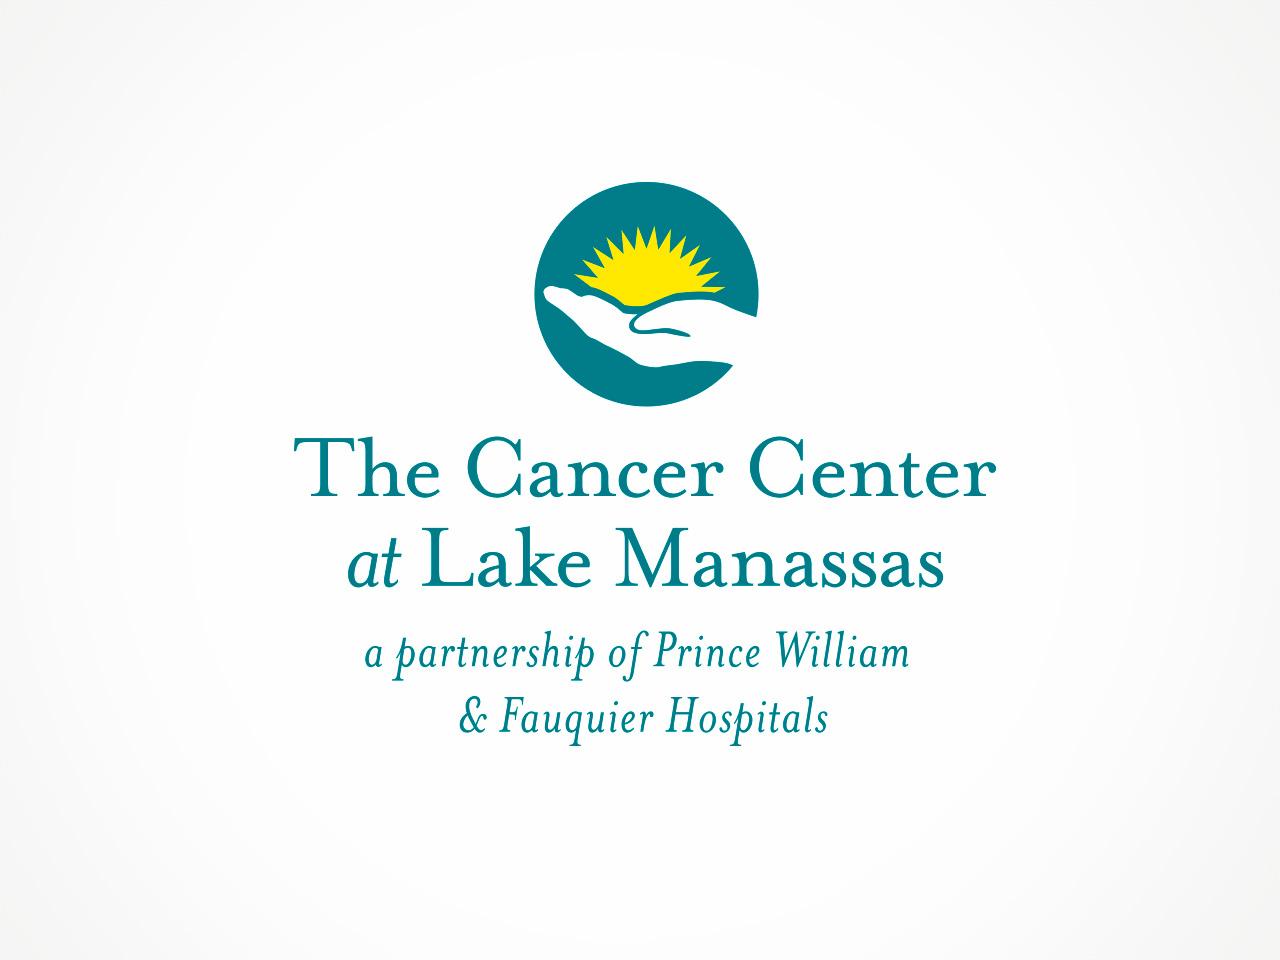 The Cancer Center at Lake Manassas logo